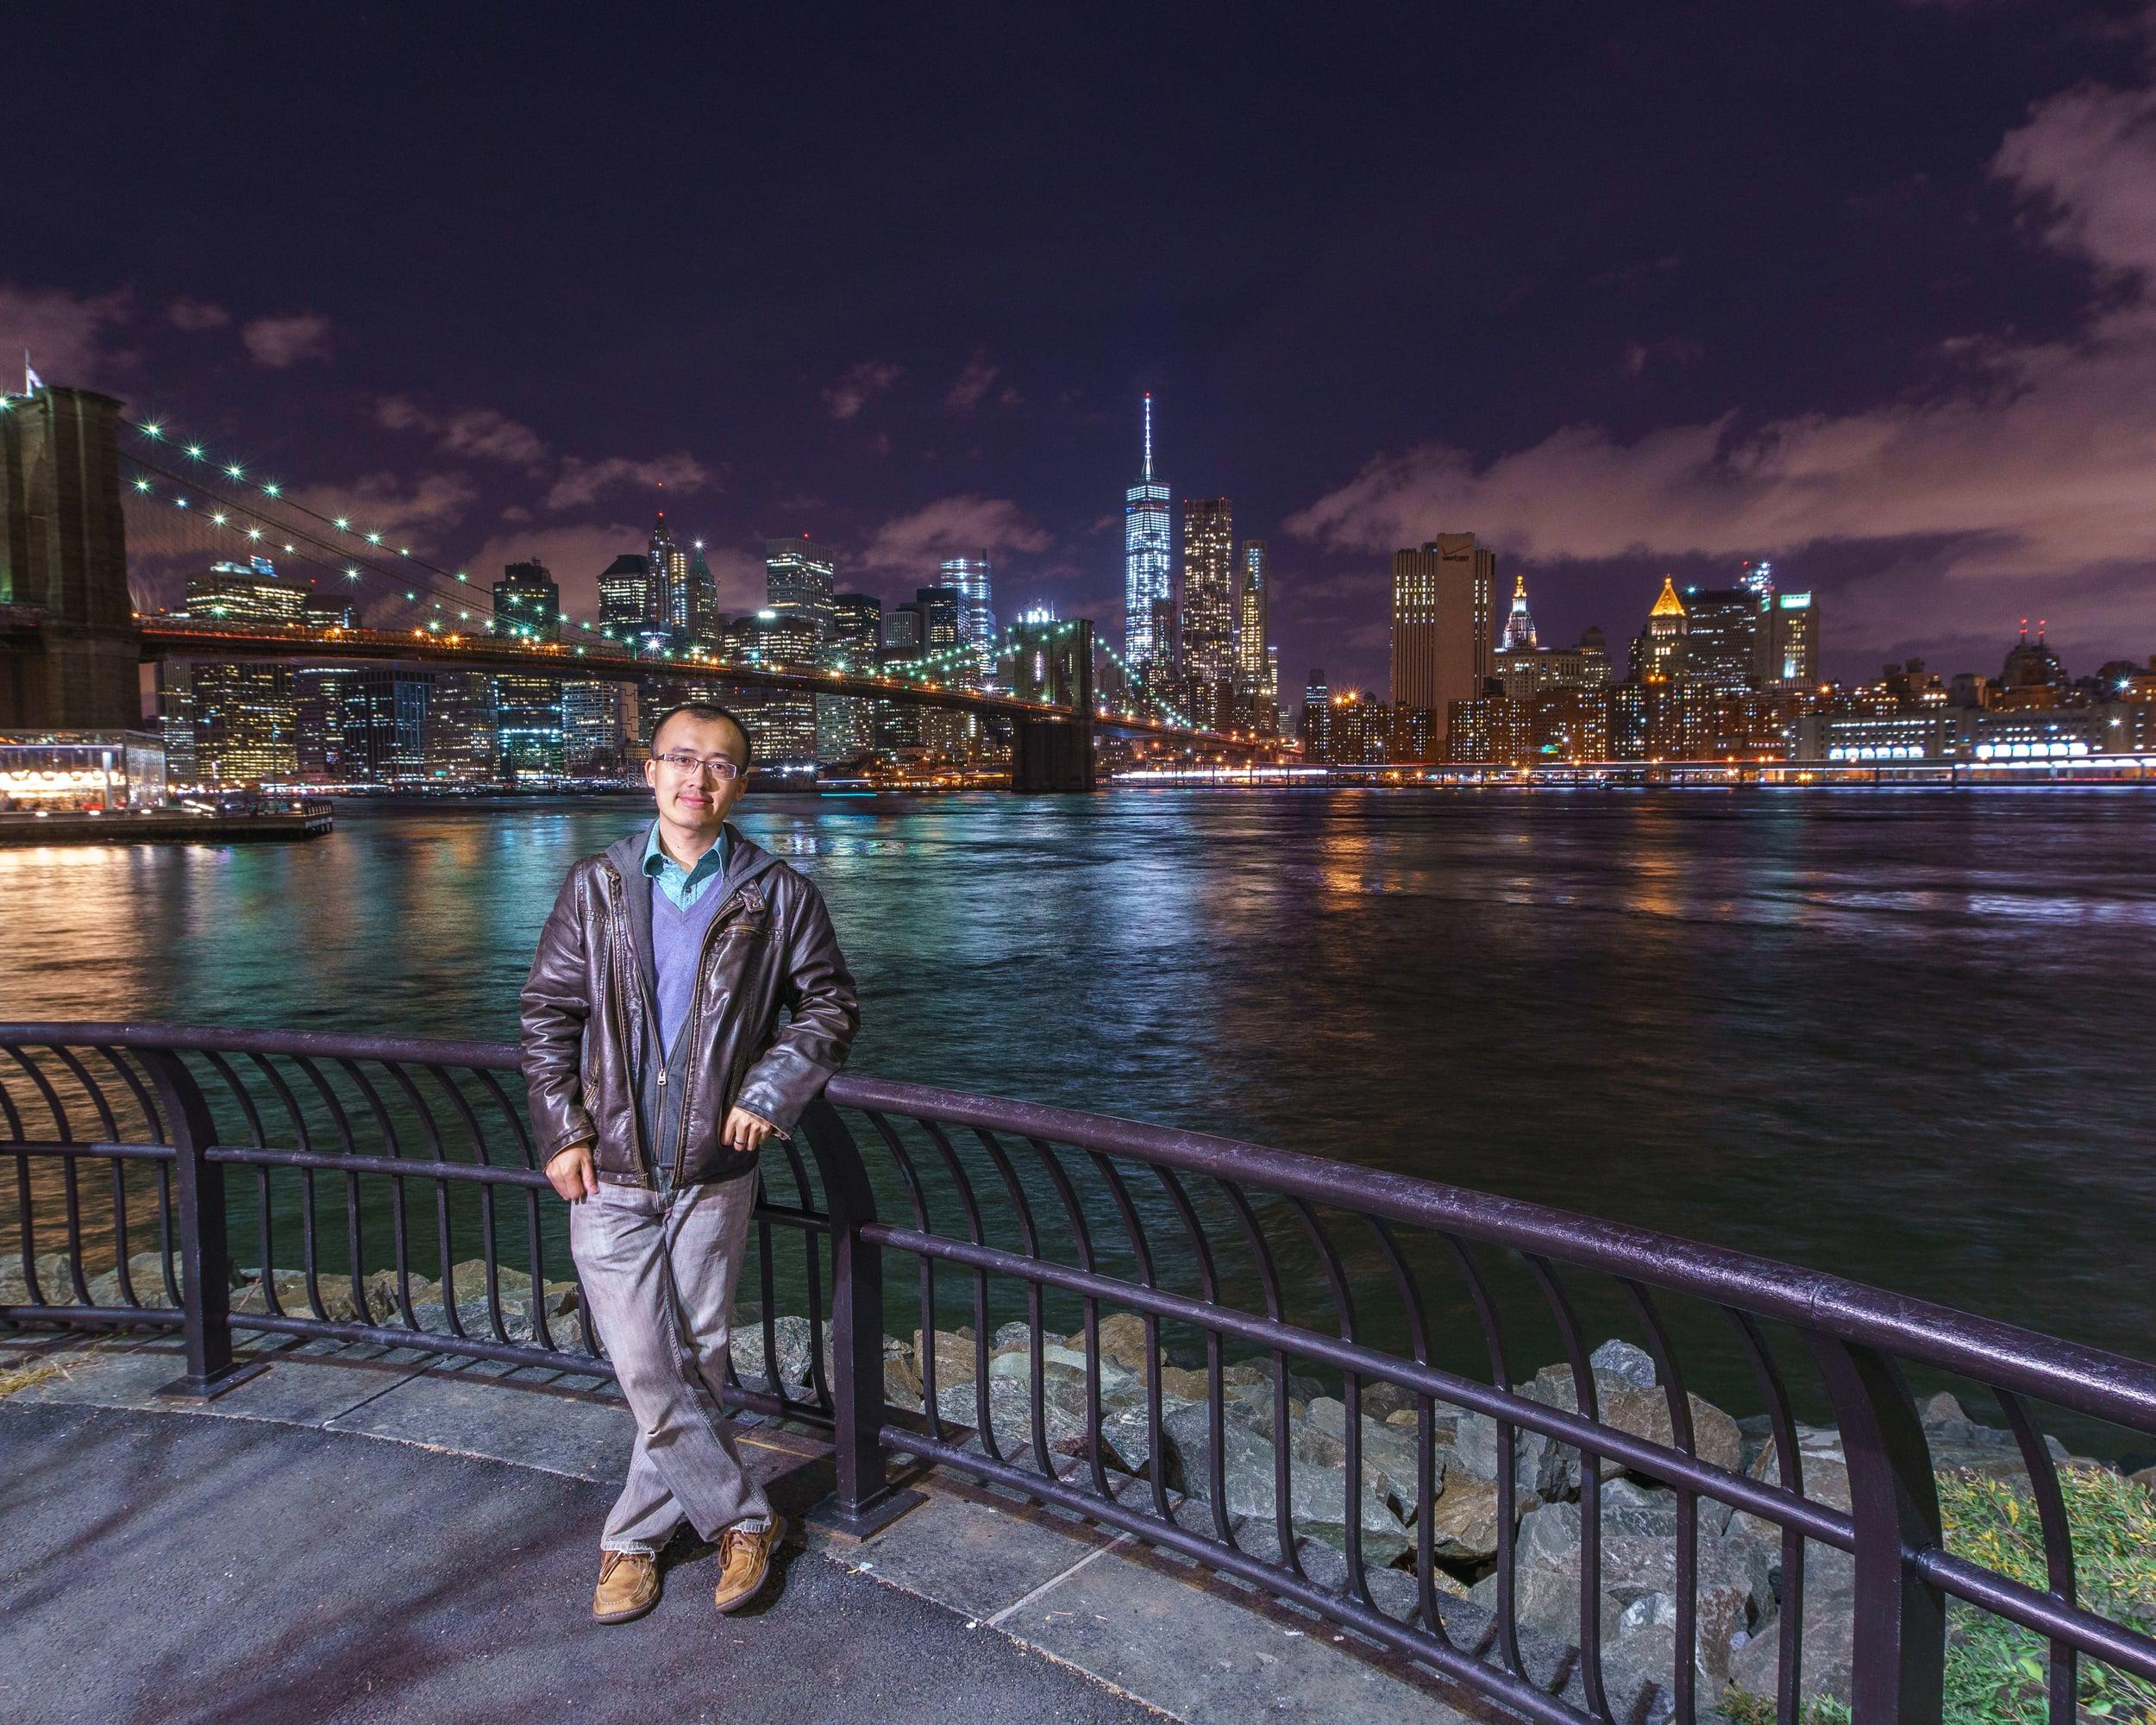 Selfie in the beautiful NYC